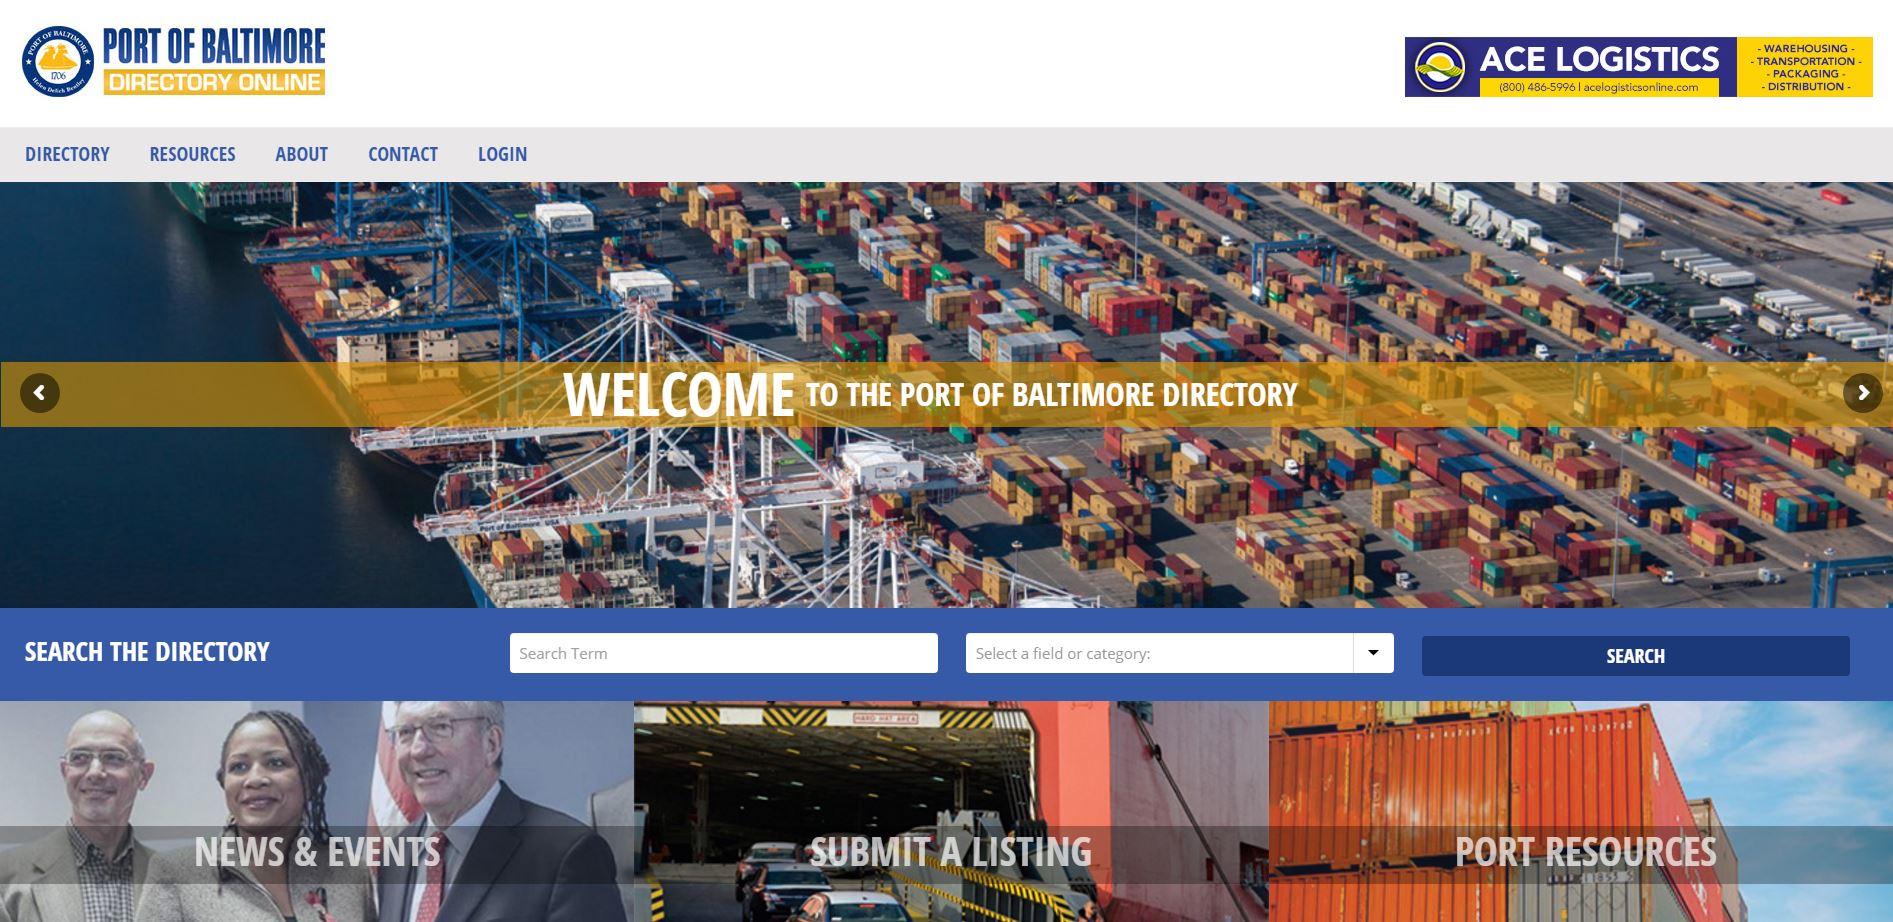 Port of Baltimore Directory Online: Web Development